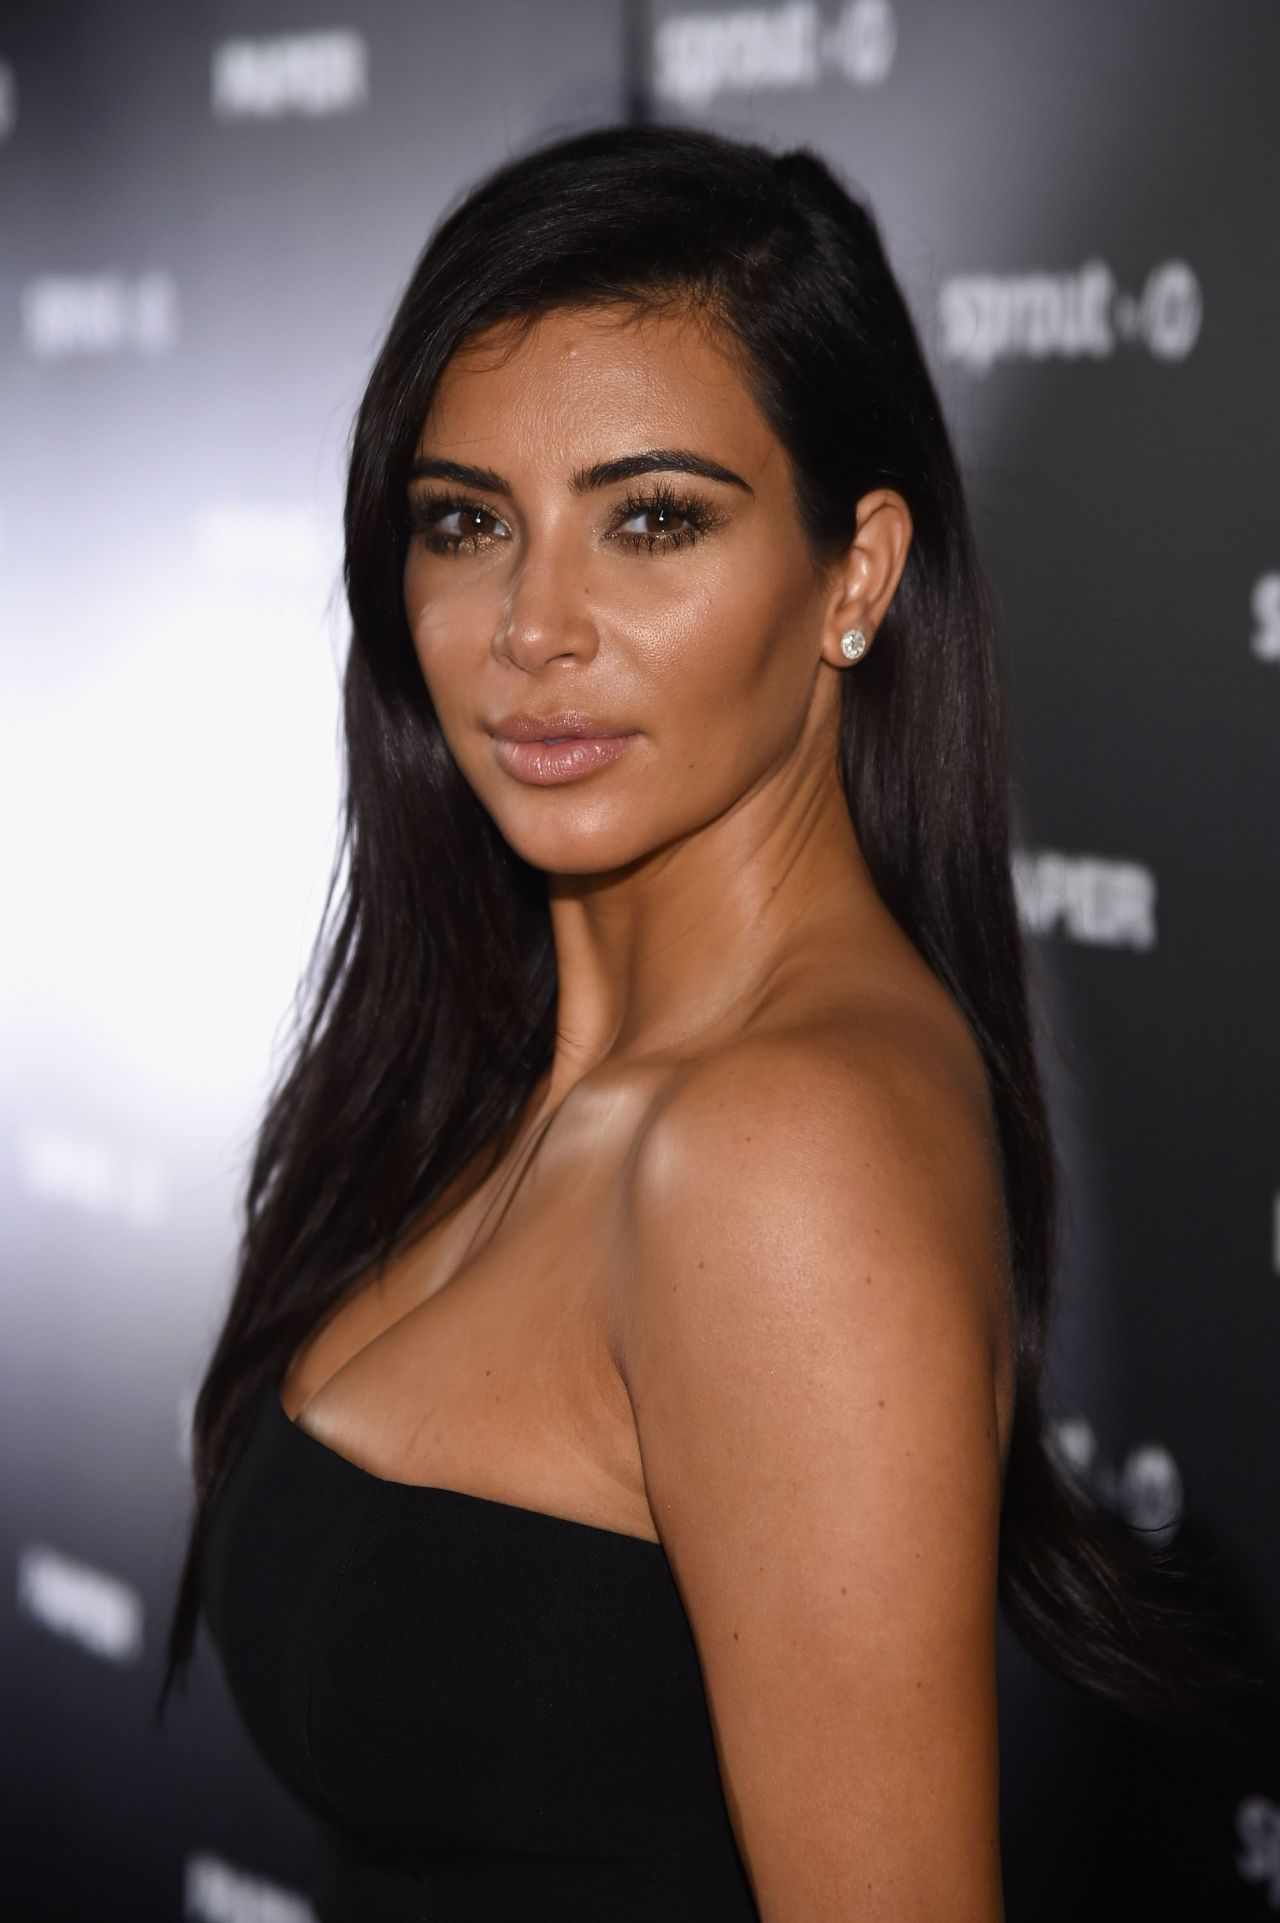 kim-kardashian-paper-magazine-break-the-internet-issue-release-in-miami_3